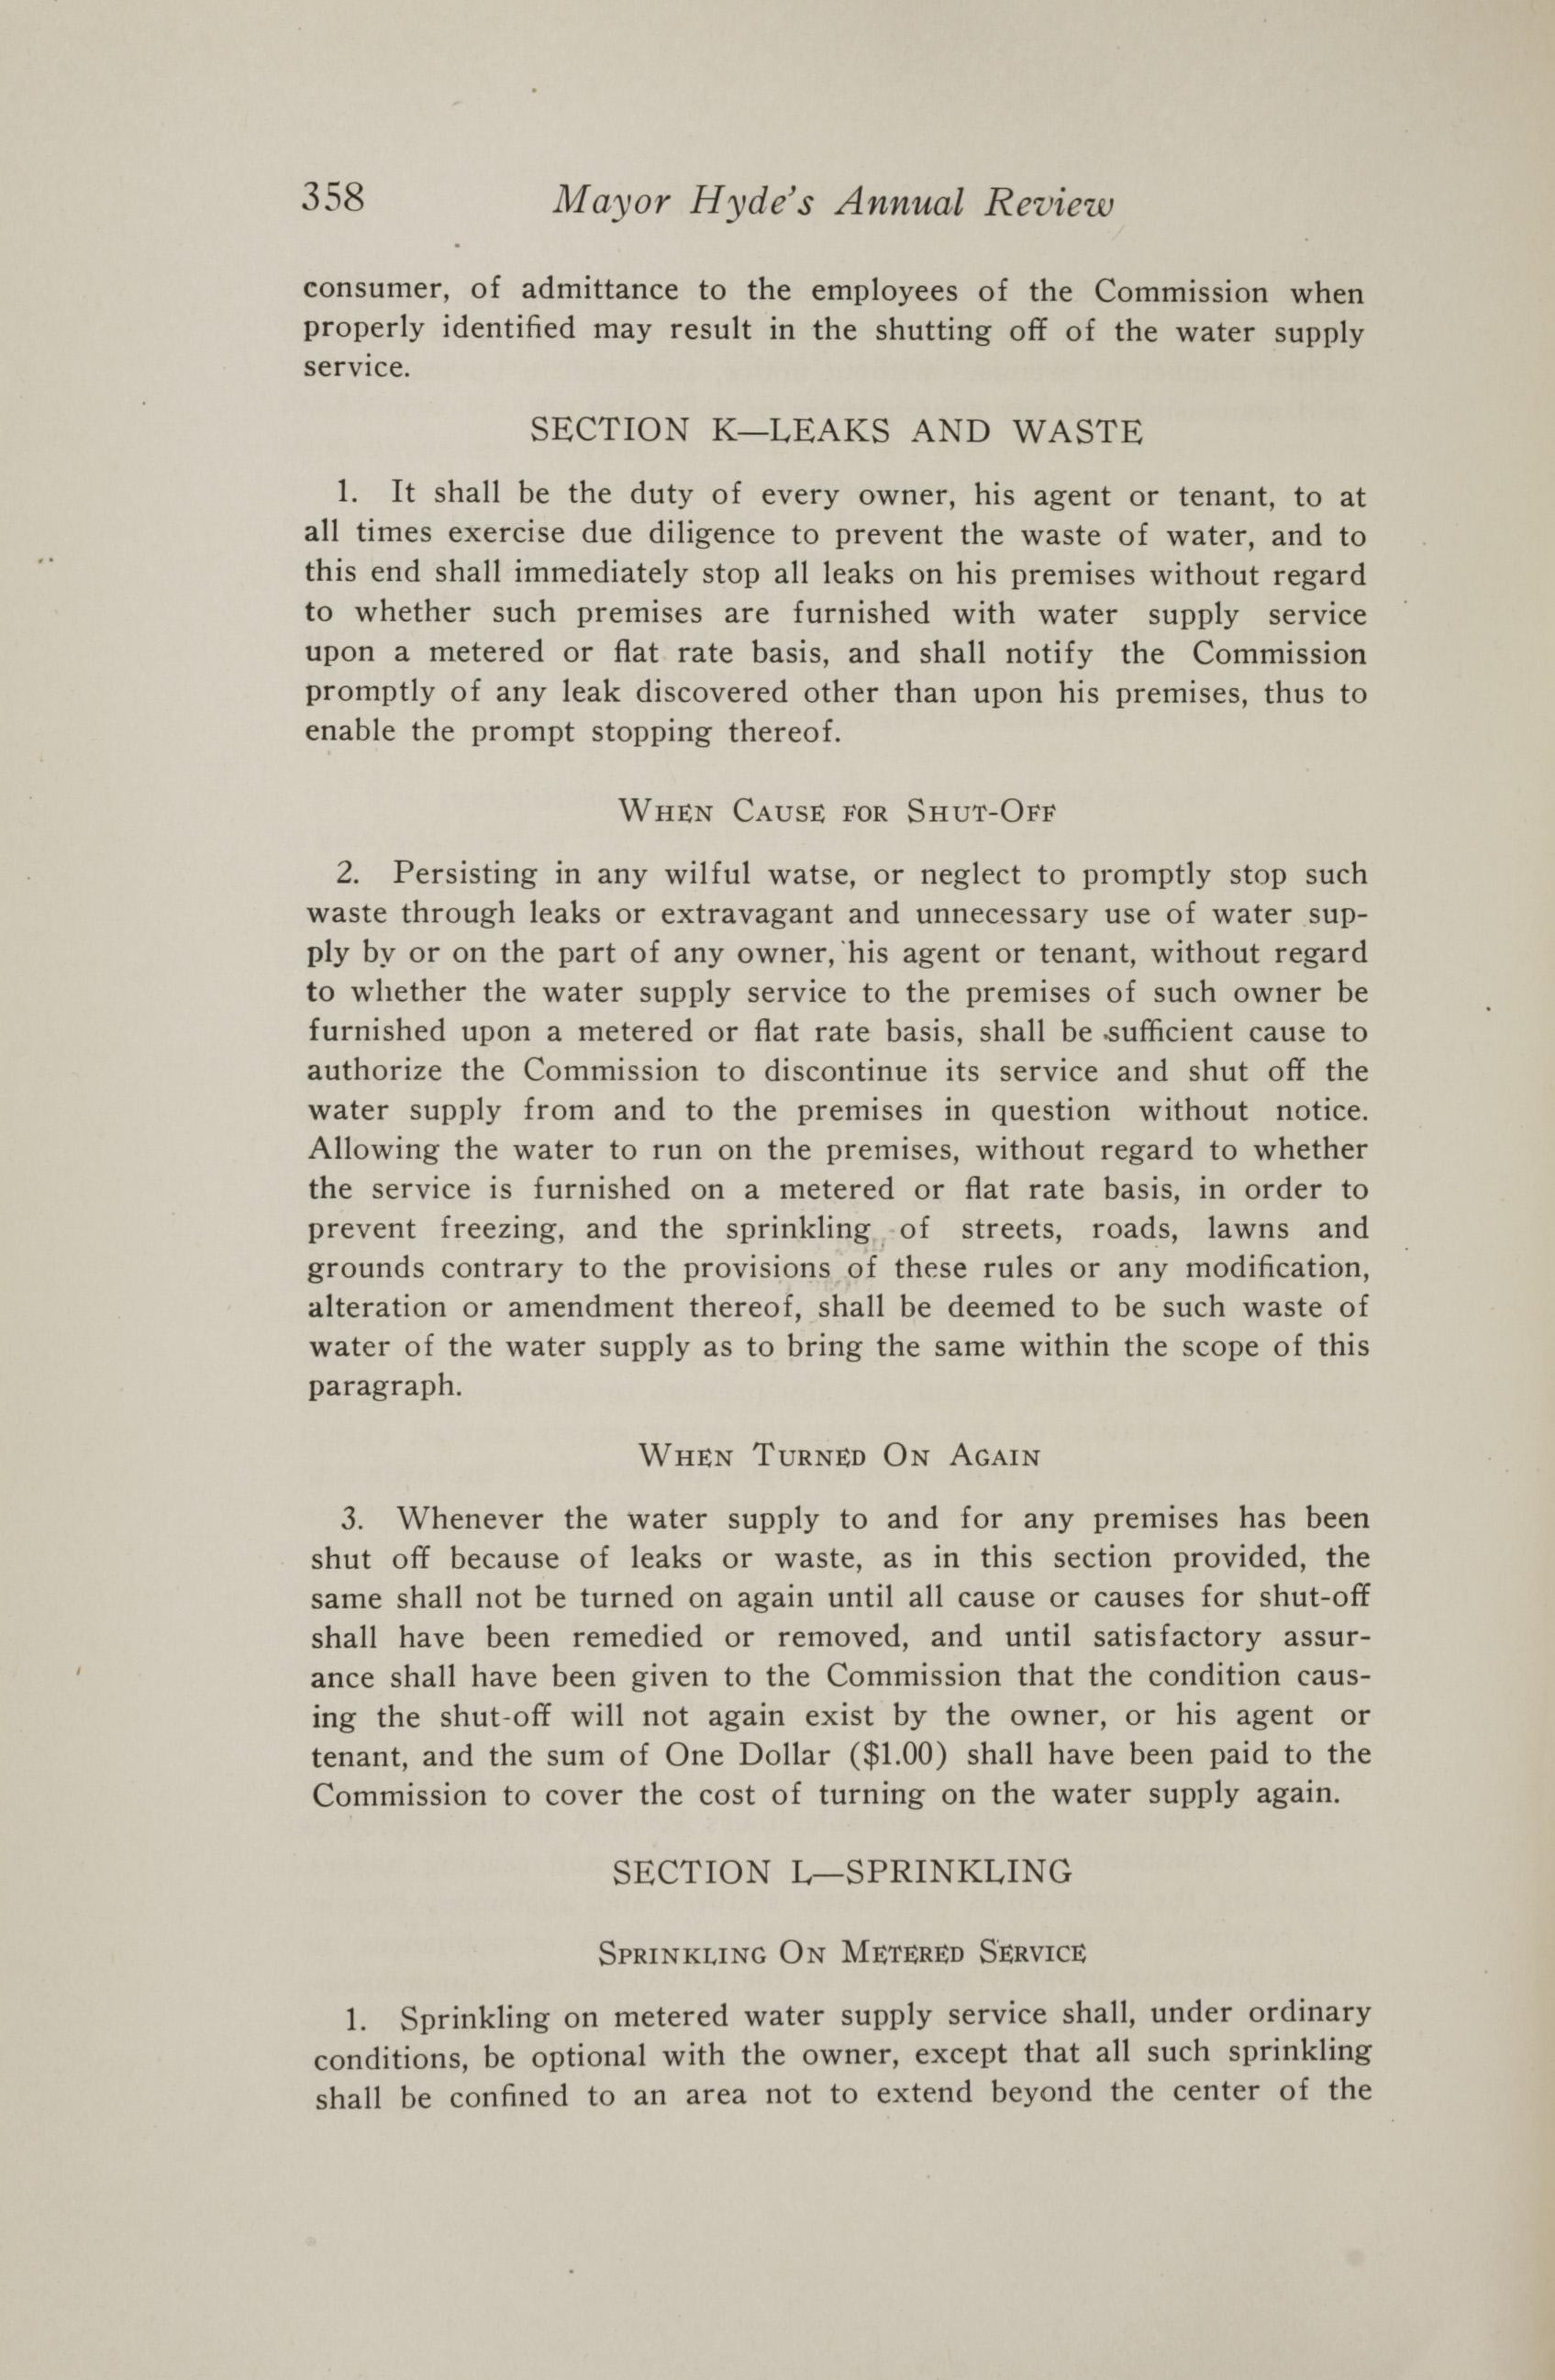 Charleston Yearbook, 1917, page 358